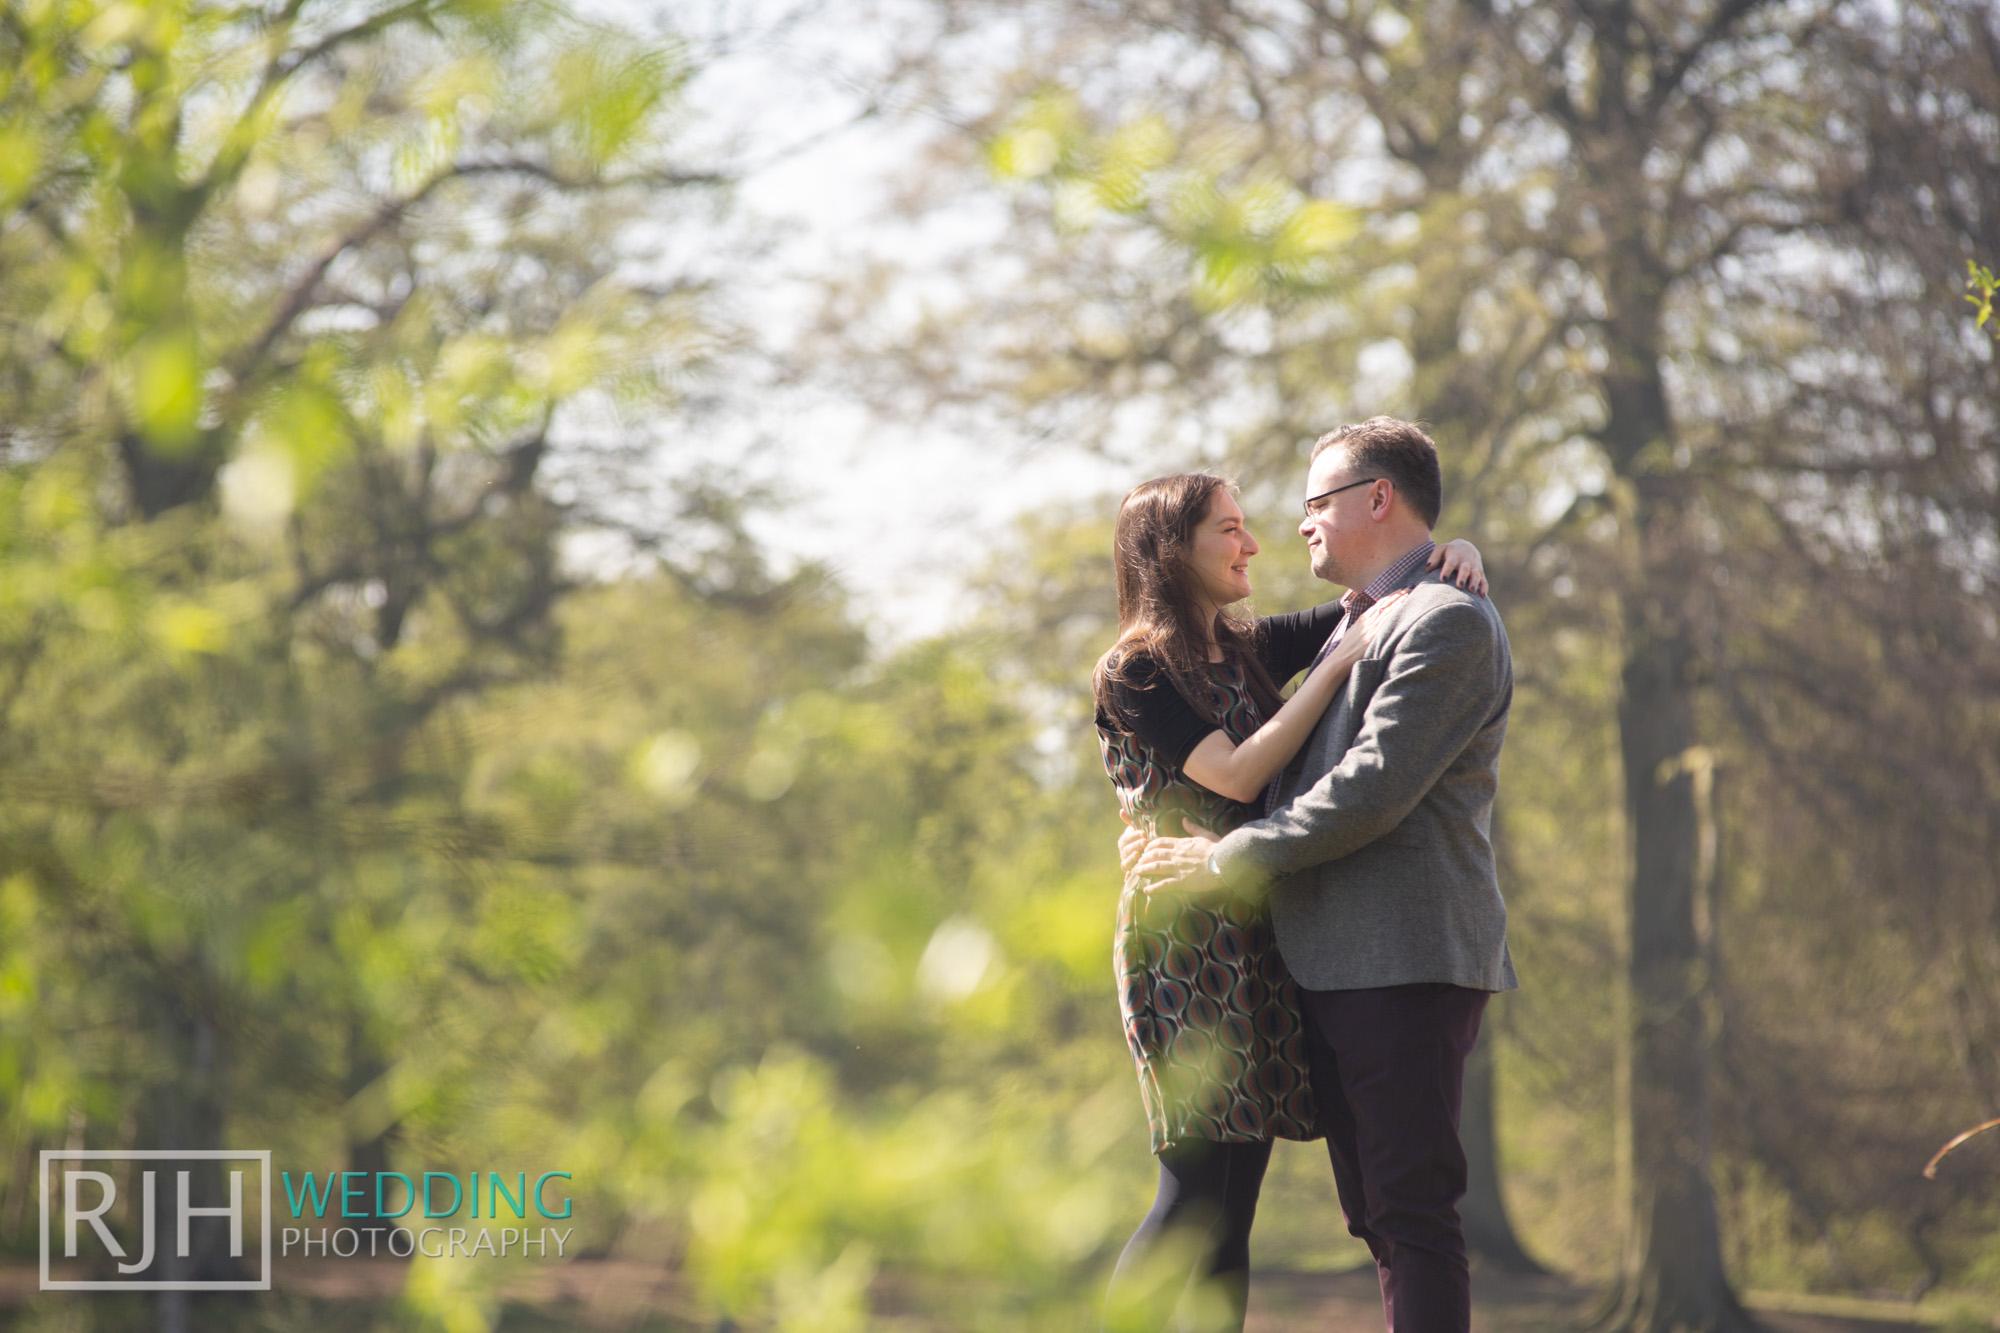 Pre-wedding photography - Richard & Rachel_012_3C2A8184.jpg